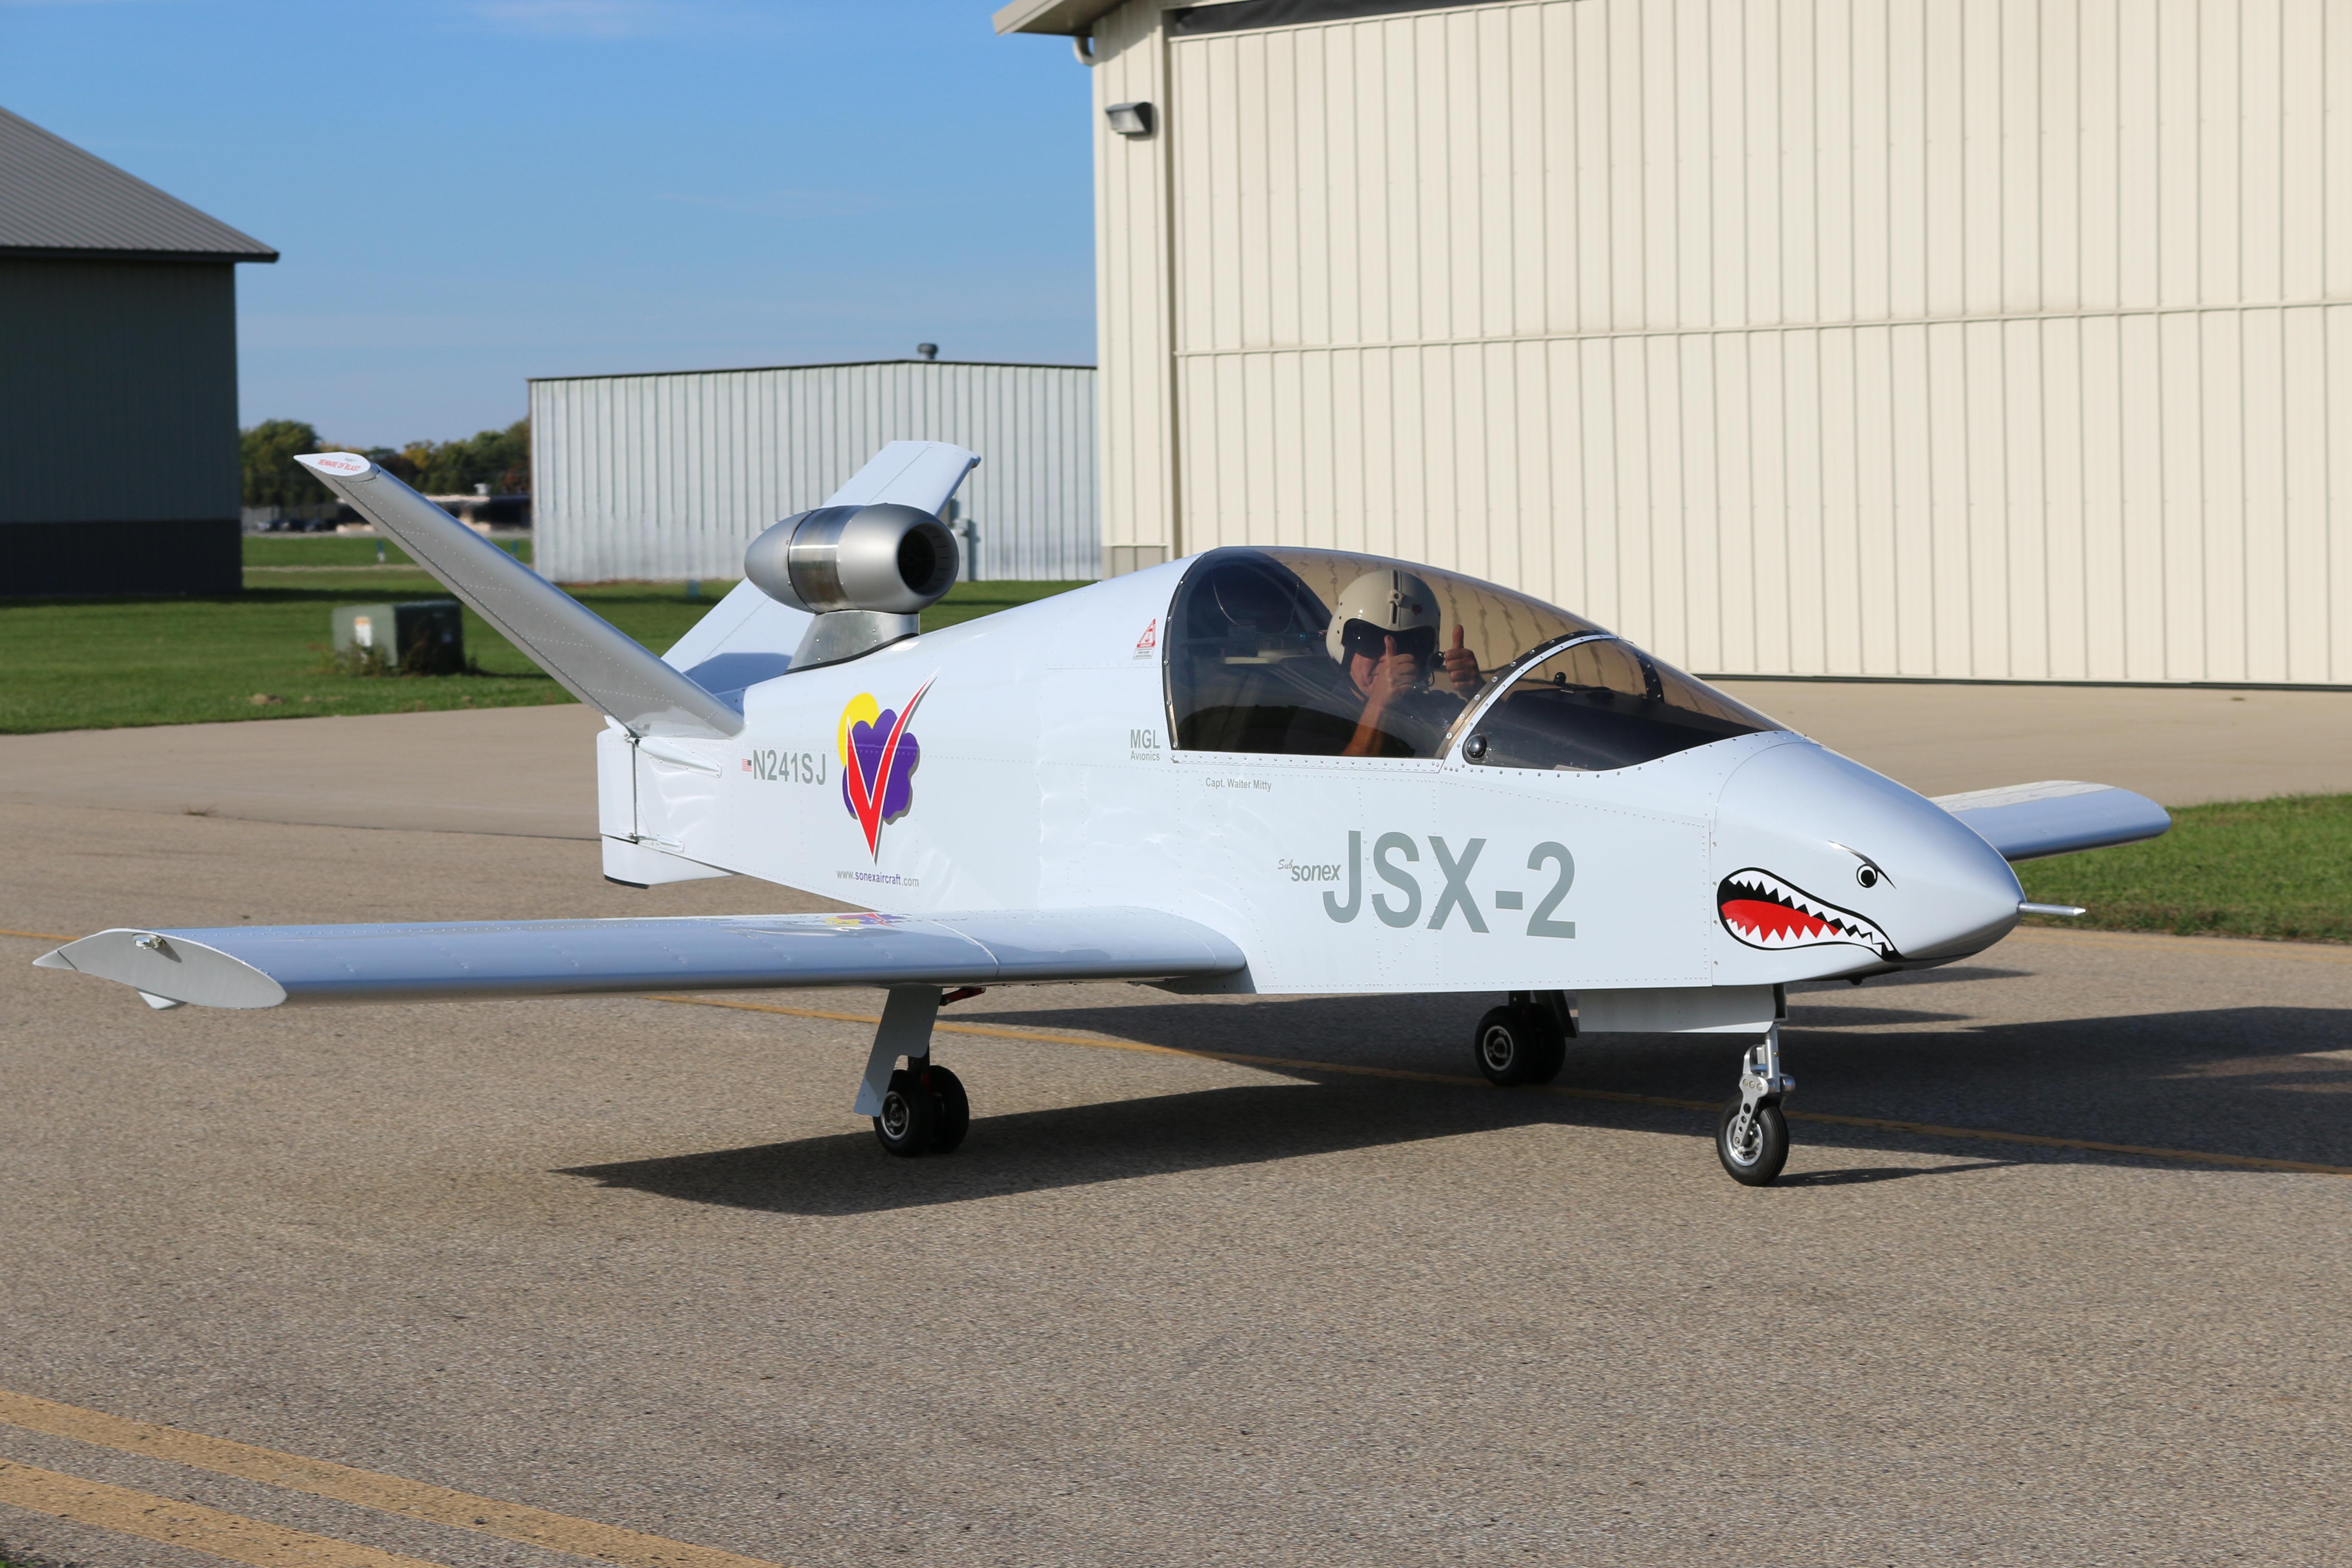 SubSonex Personal Jet Now More Affordable! �C Sonex Aircraft5472 x 3648 jpeg 7717kB